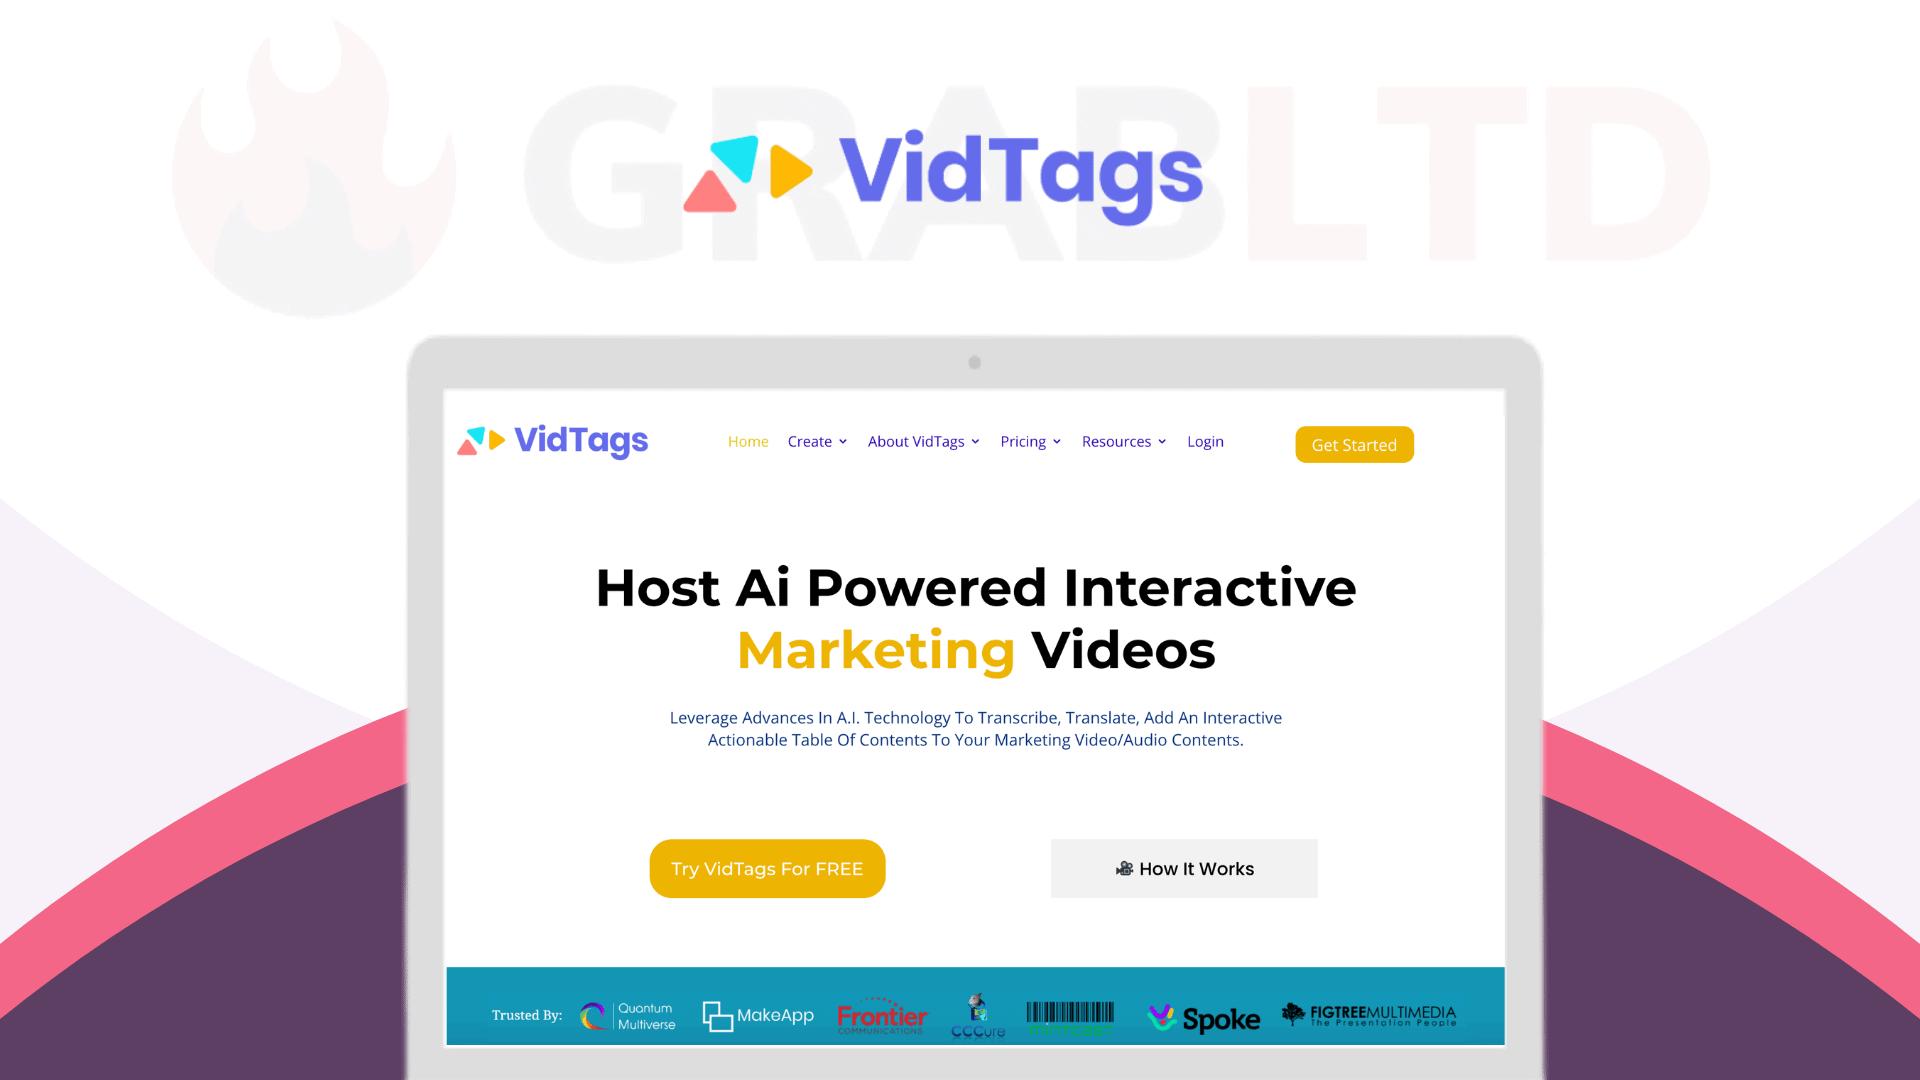 VidTags   Host AI Powered Interactive Marketing Videos 1